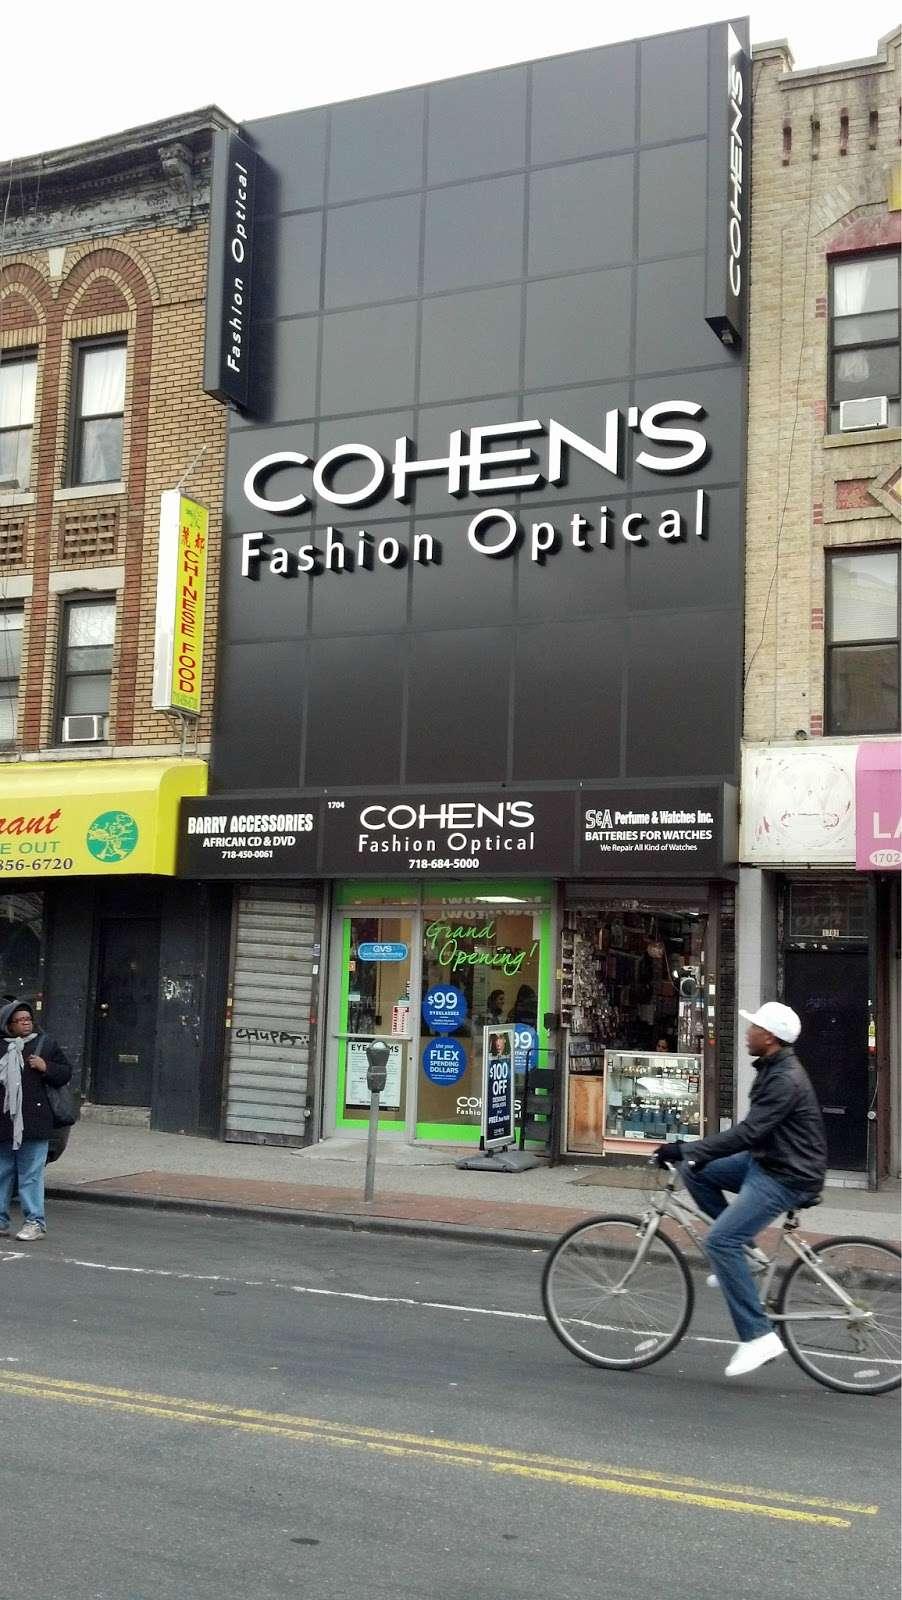 Cohens Fashion Optical - store  | Photo 2 of 7 | Address: 1704 Church Ave, Brooklyn, NY 11226, USA | Phone: (718) 684-5000